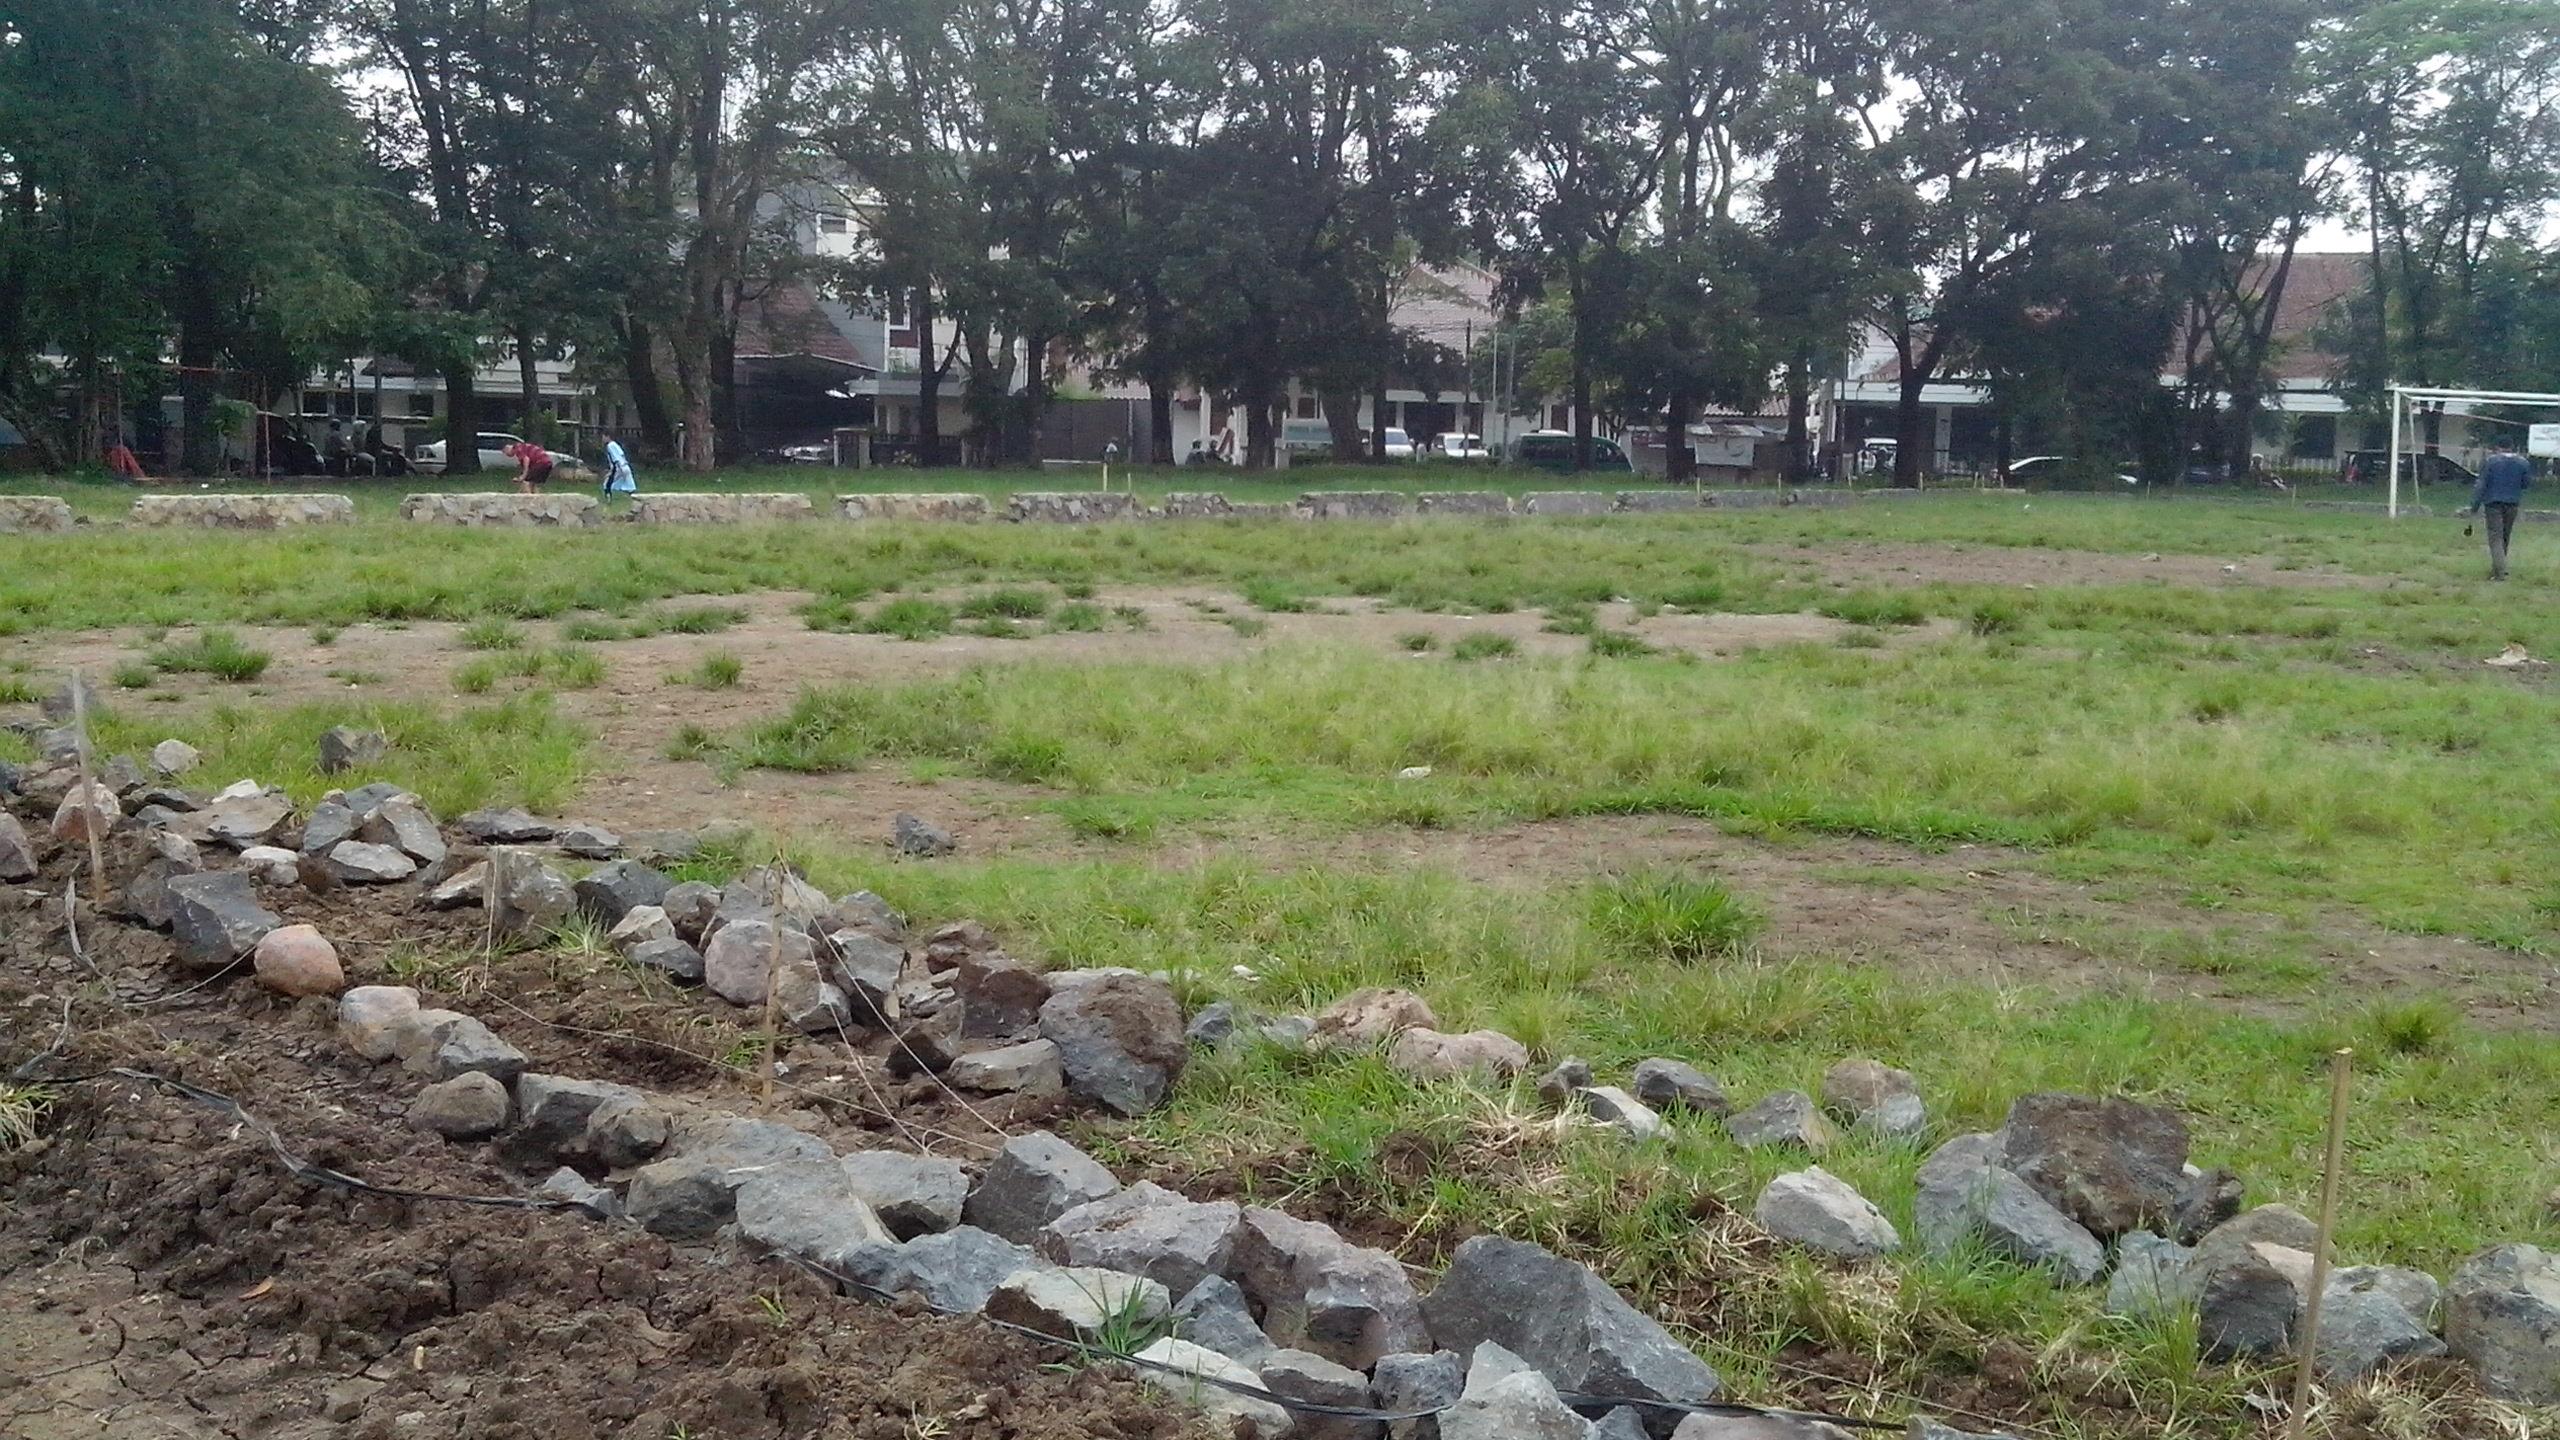 Kisah Lapangan Supratman Permasalahan Sepak Bola Revitalisasi Taman Kota Bandung